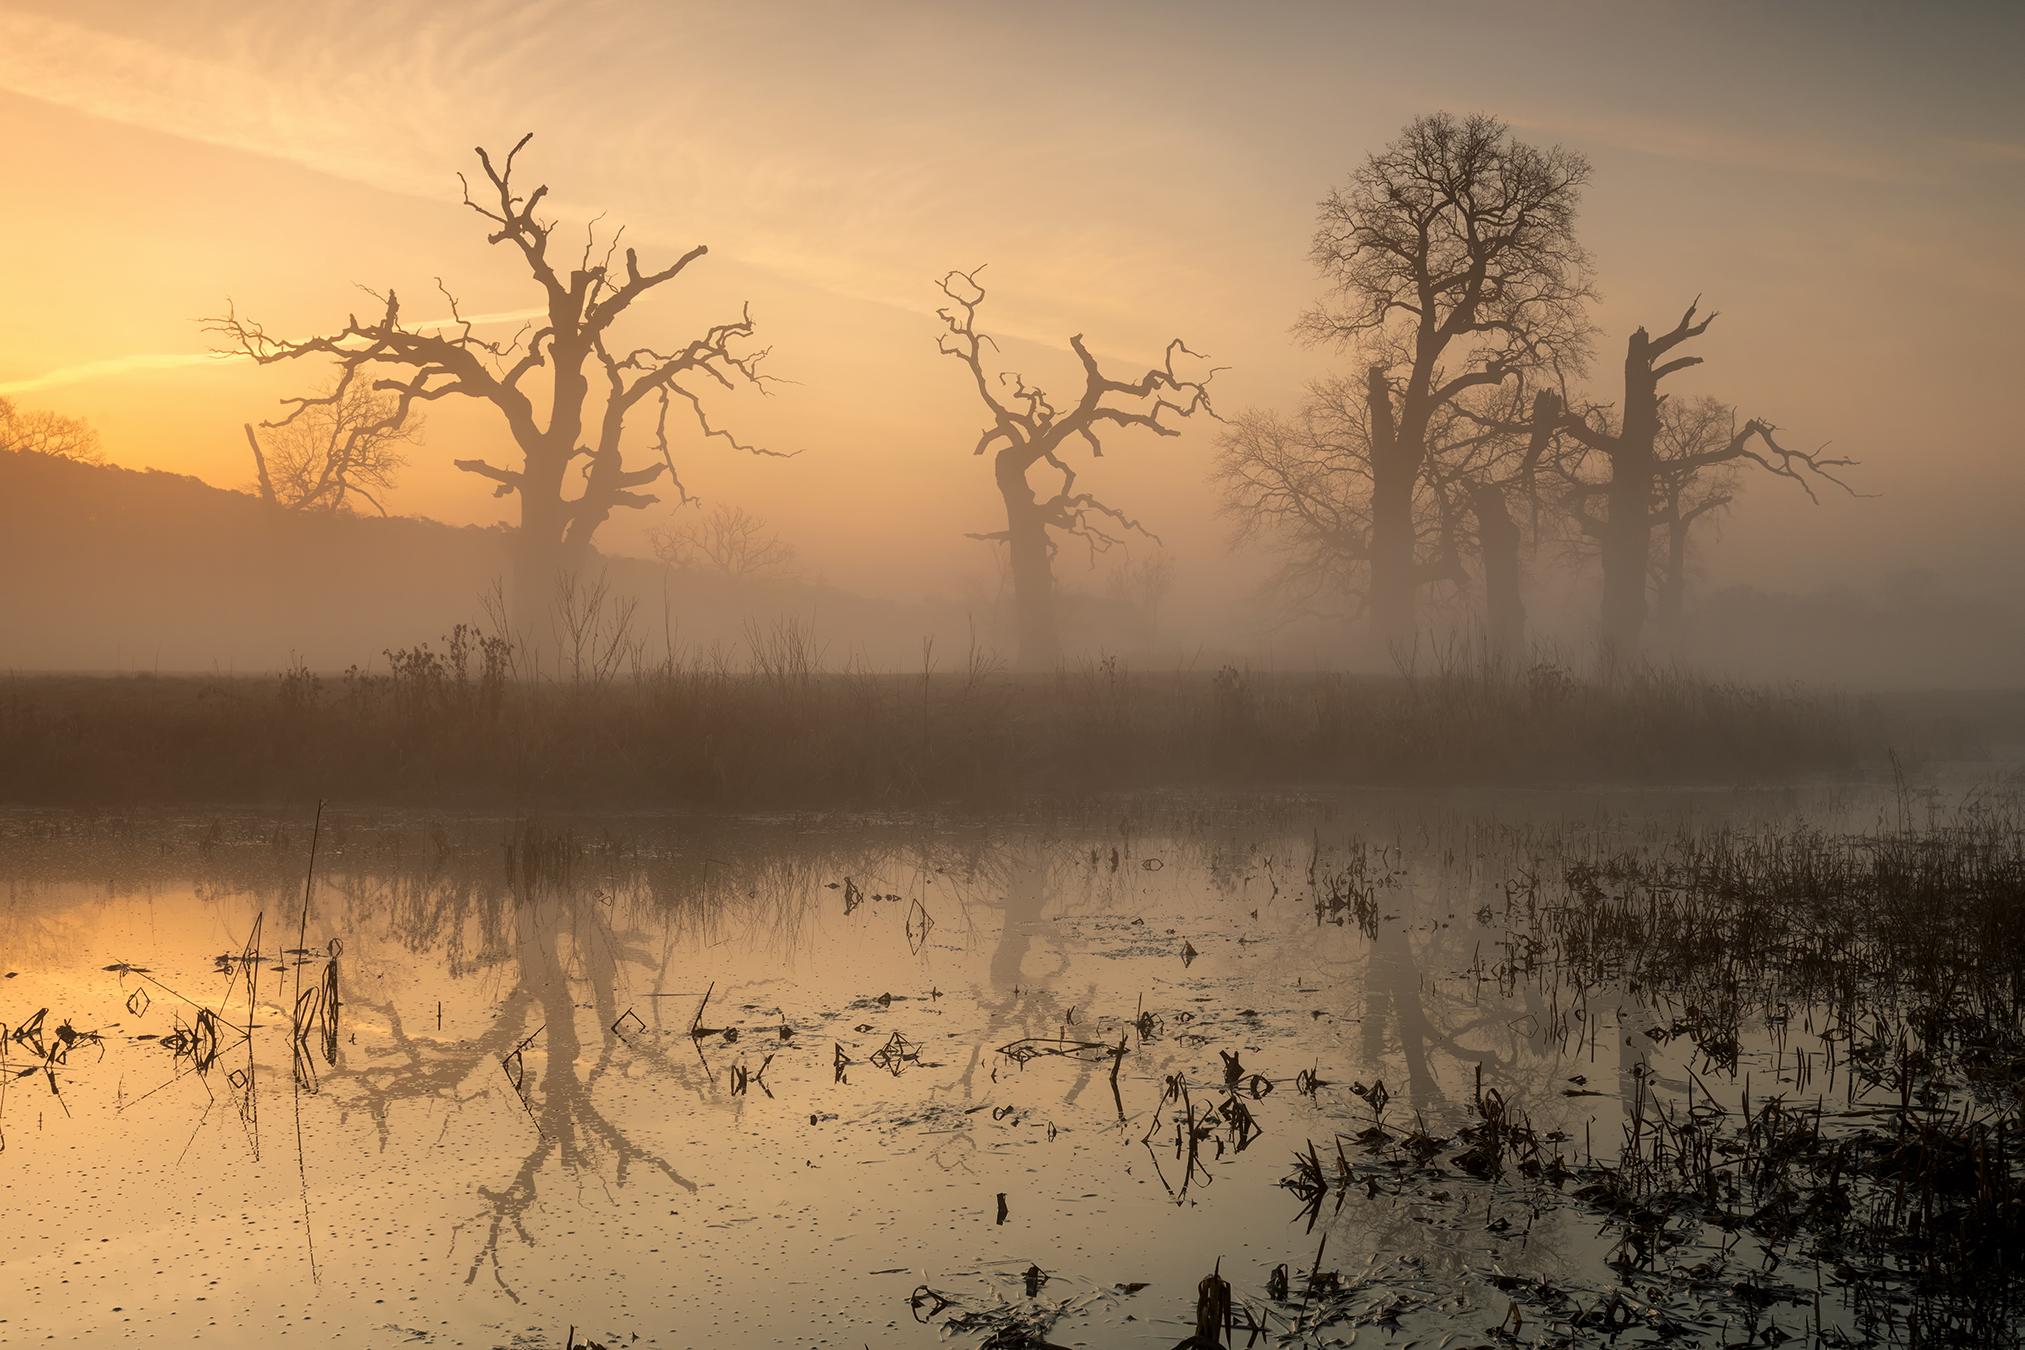 Mist Lake Water Winter Outdoors Landscape Sunlight Swamp Sky Photography Dead Trees Morning Sunrise 2025x1350